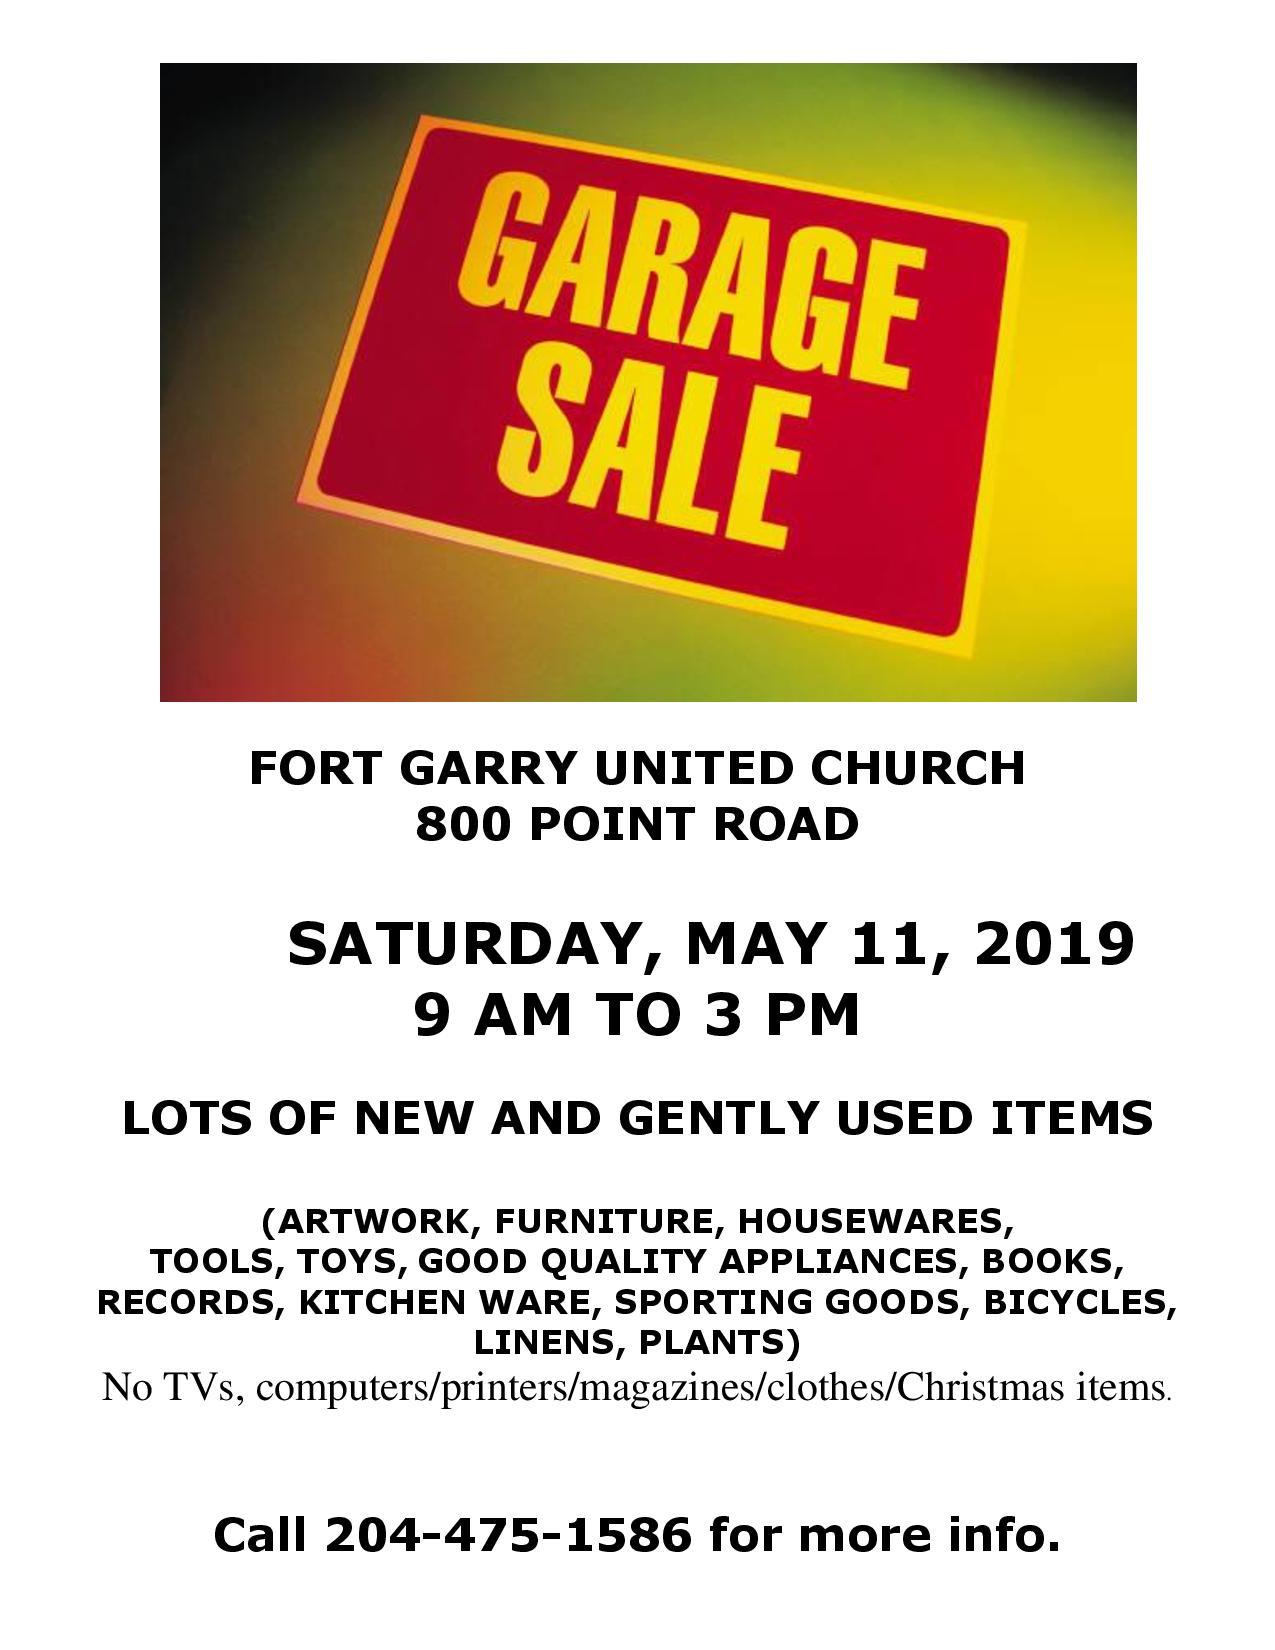 Fort Garry United Church - Garage Sale - Active Aging in Manitoba